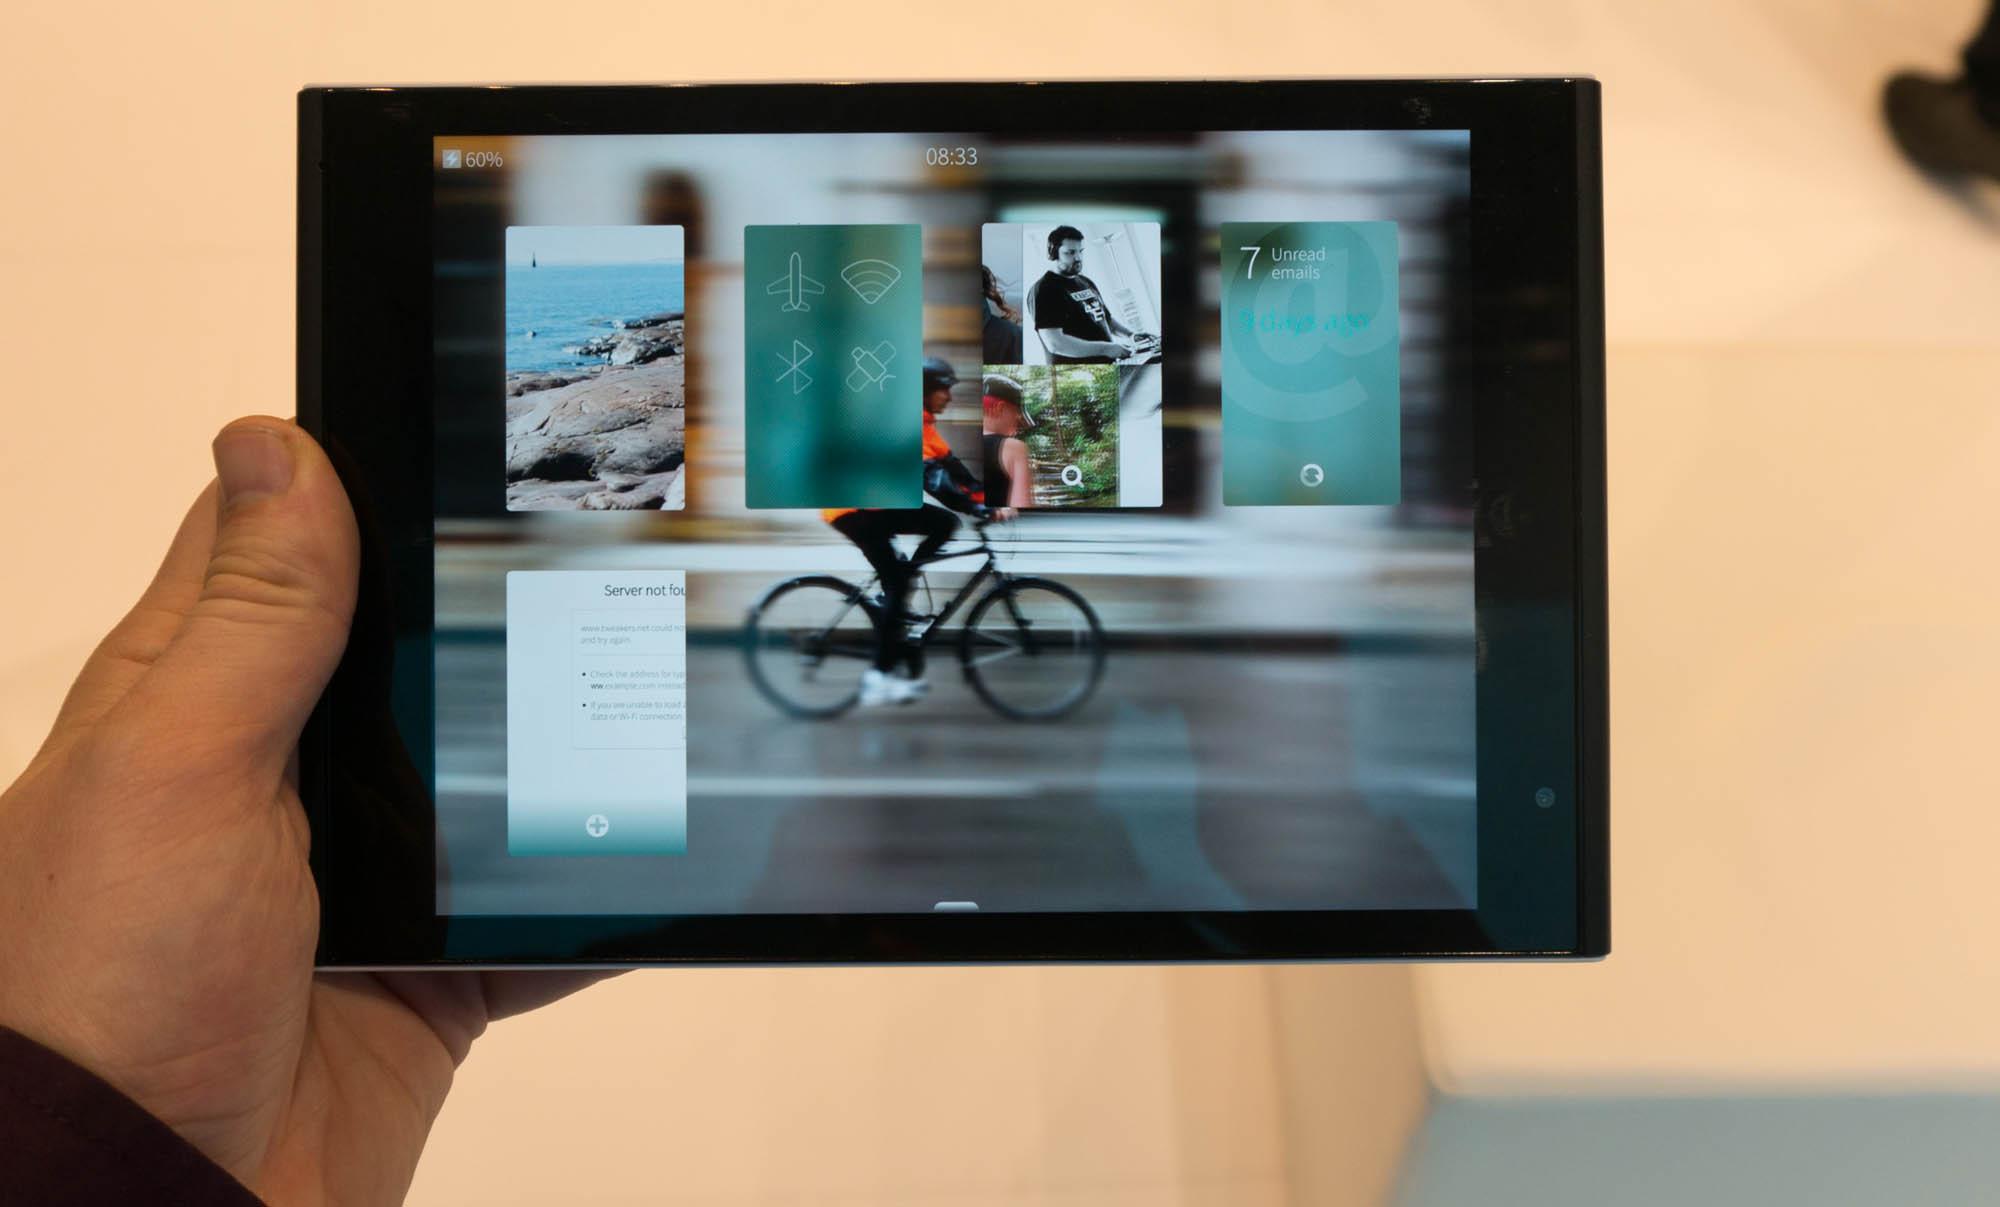 Jolla Tablet Preview - Sailfish OS op weg naar volwassenheid